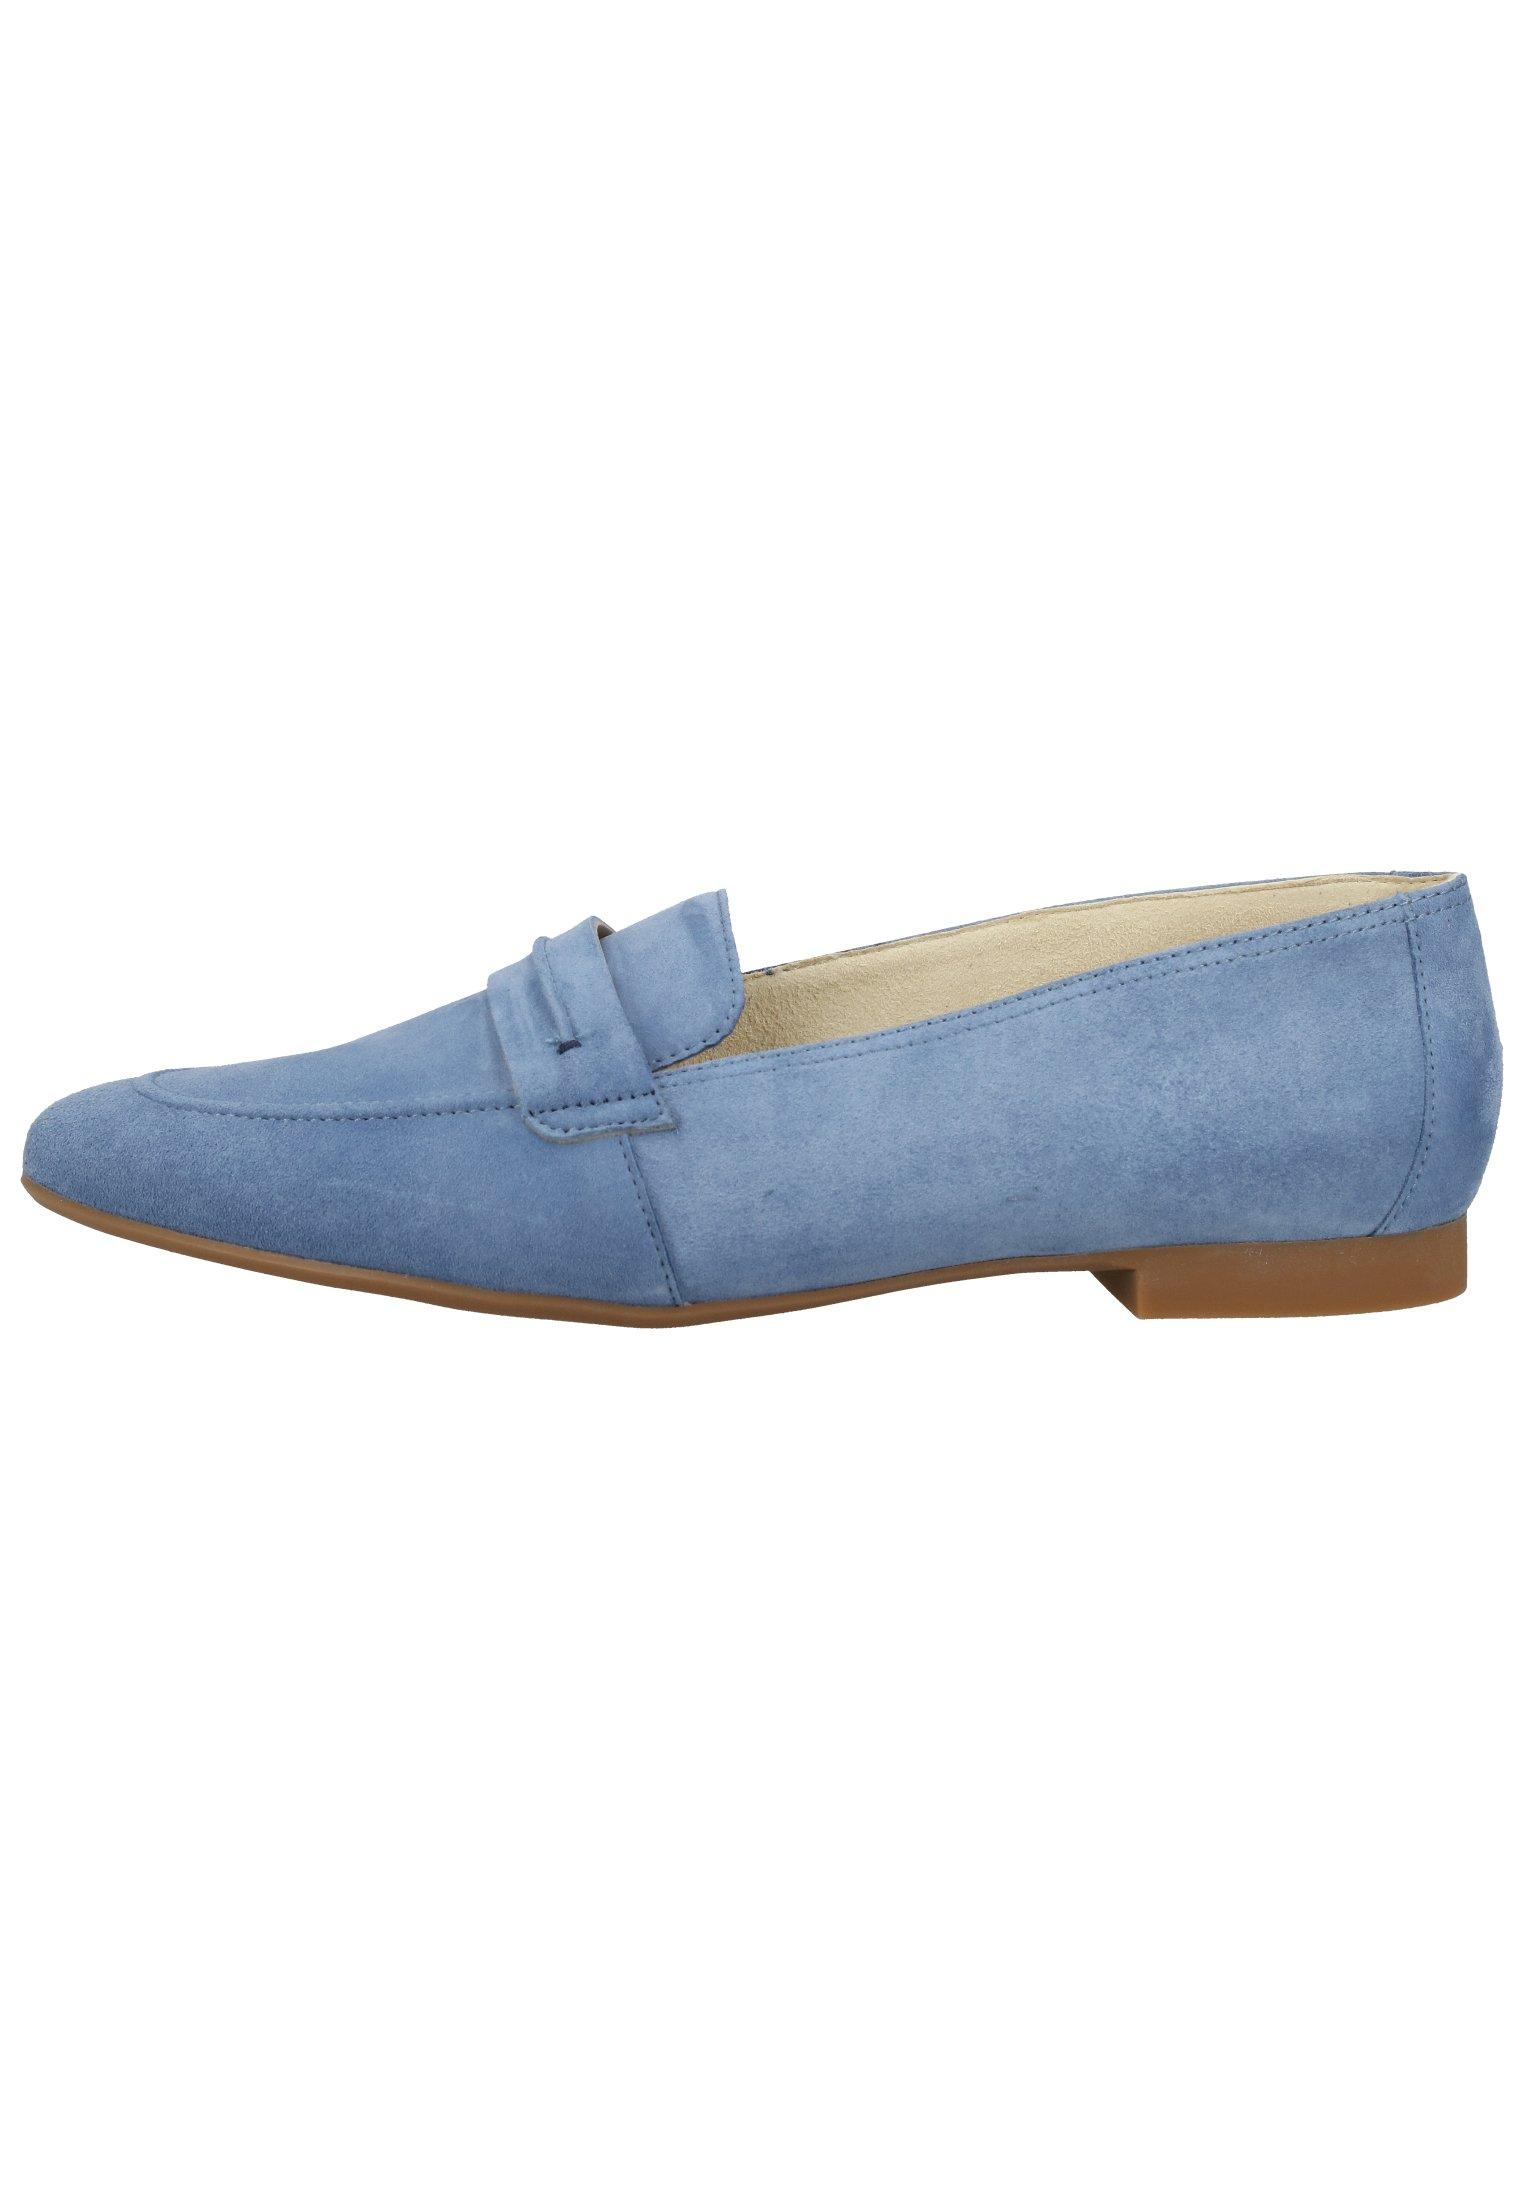 Women Slip-ons - denim-blau